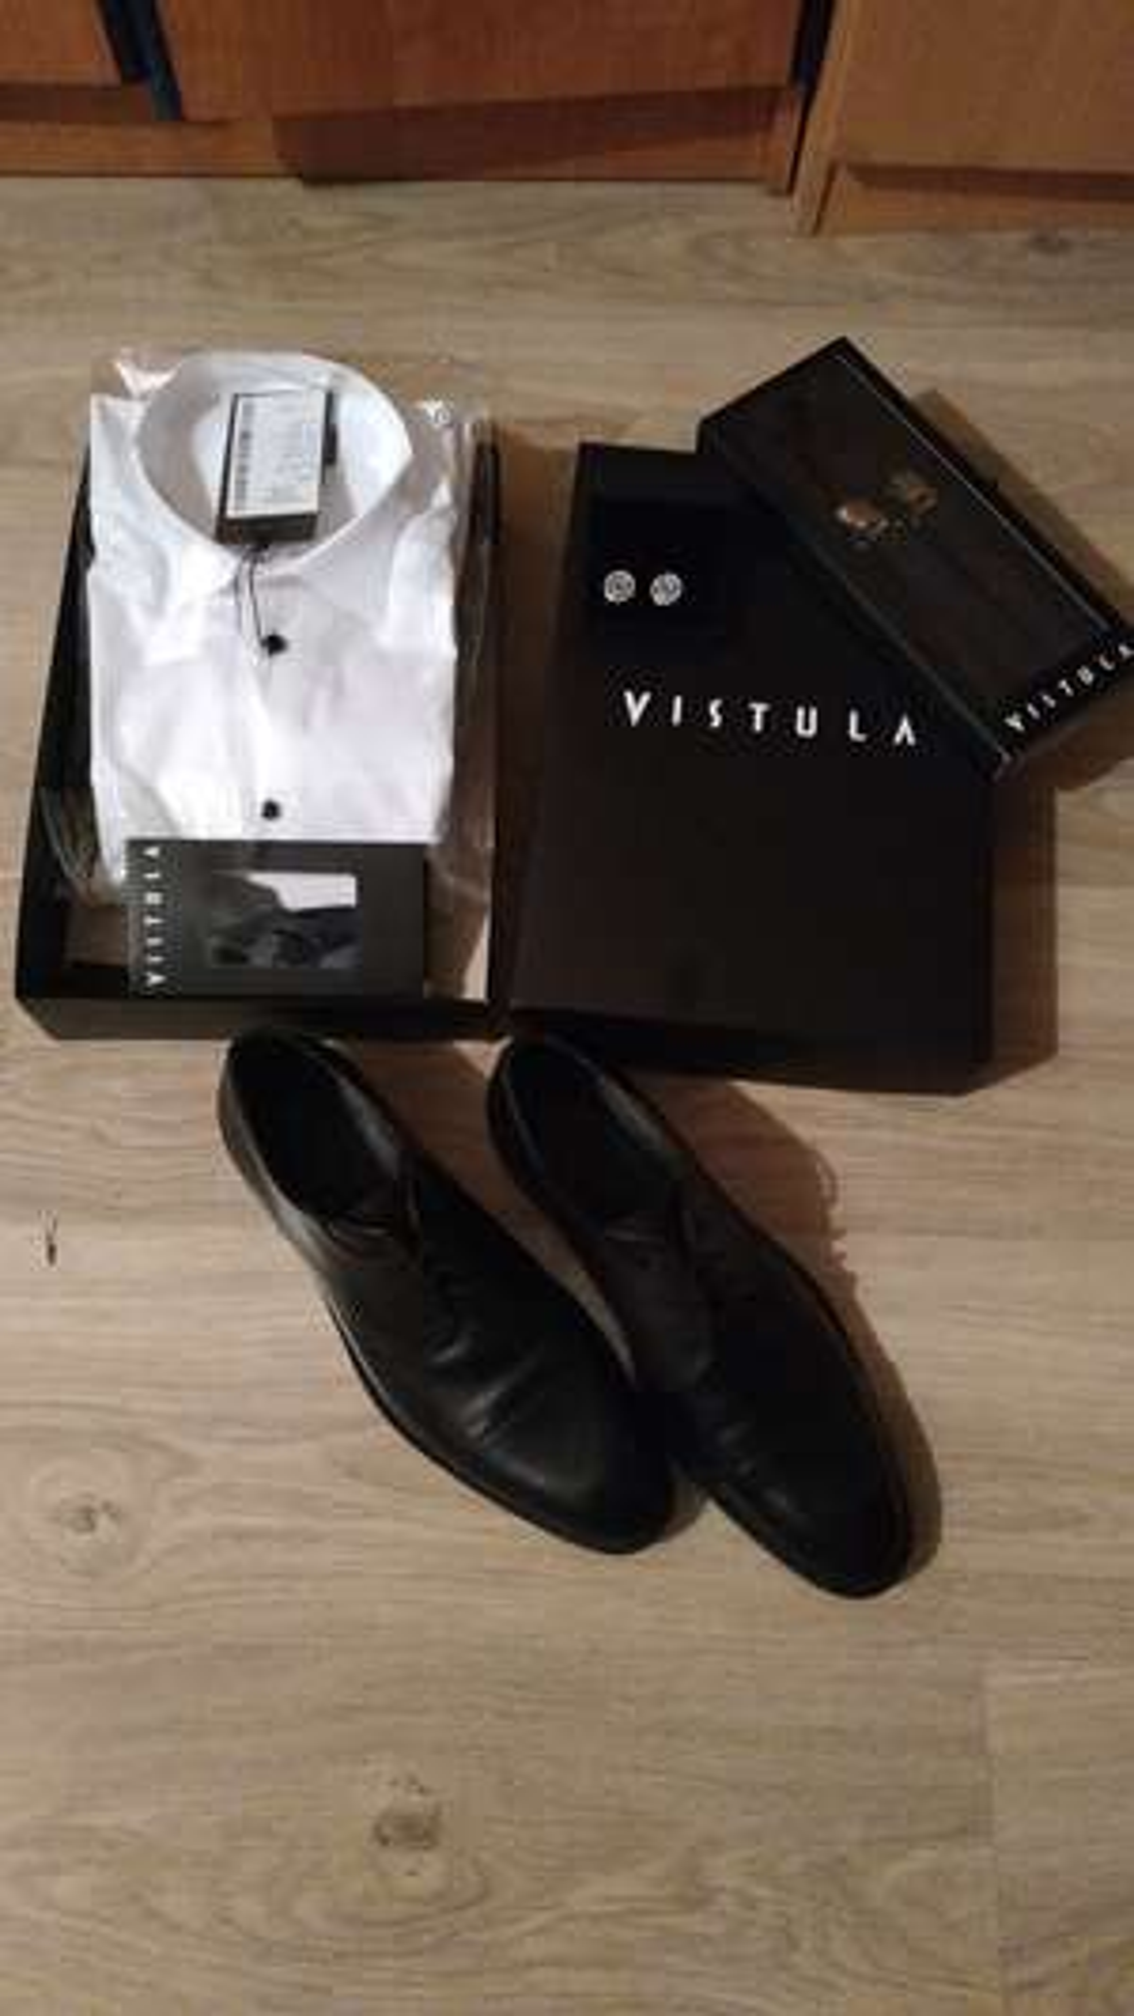 Dobra promka na garnitury ślubne bon na 1000 zł w cenie garnituru. @ Vistula